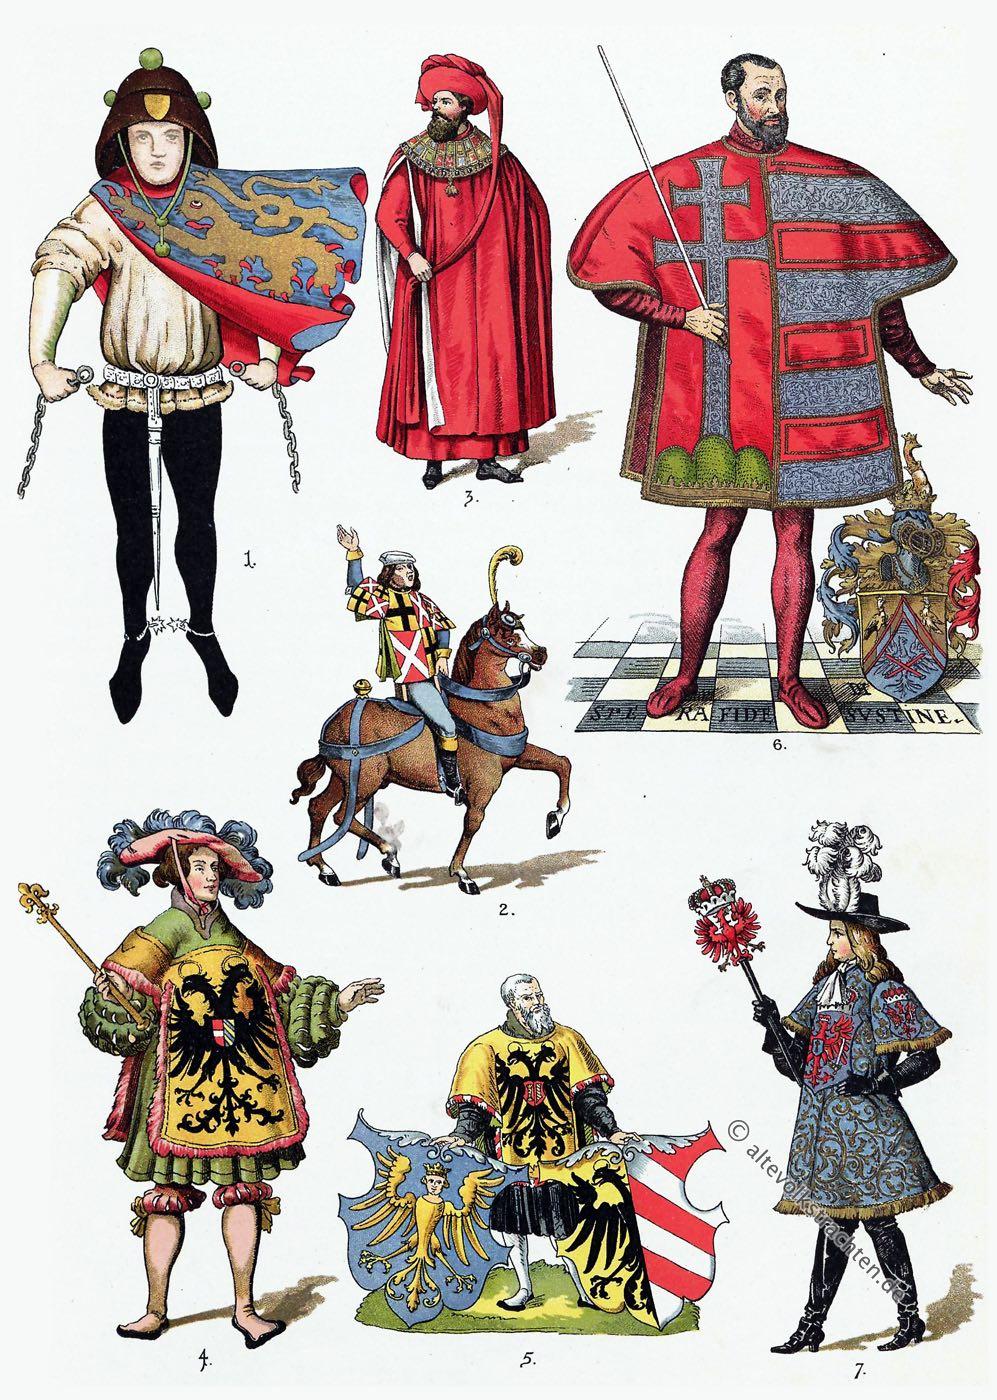 Herolde, Wappen, Heraldik, Heroldswesen, Mittelalter, Kostüme, Bekleidung, Tappert